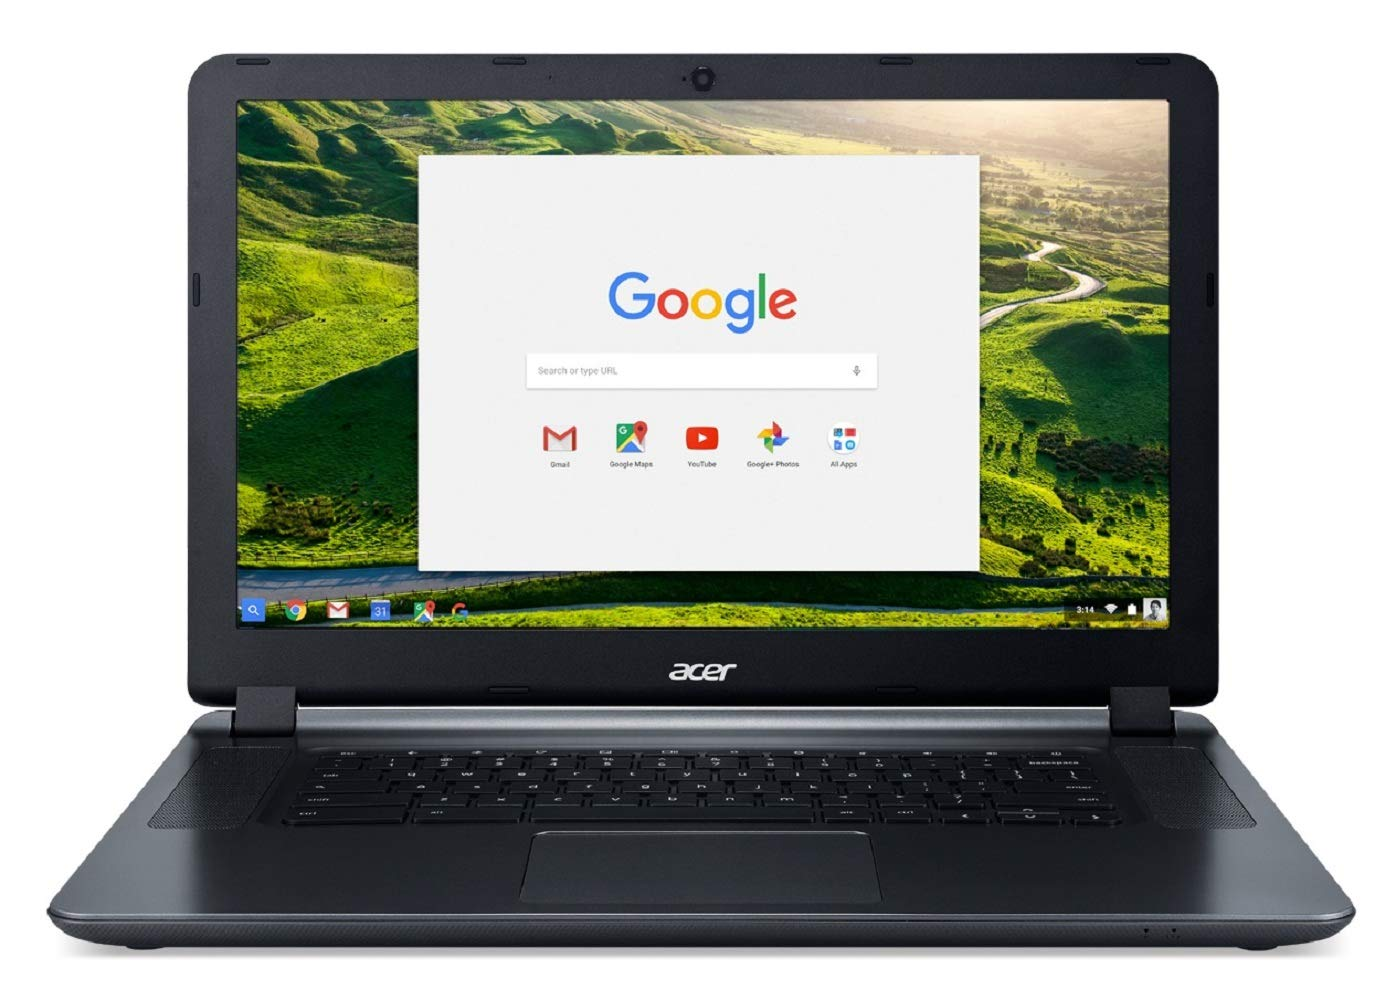 Acer Chromebook 15 Intel Celeron 1.6 GHz 4 GB Ram 32GB Flash Chrome OS Renewed